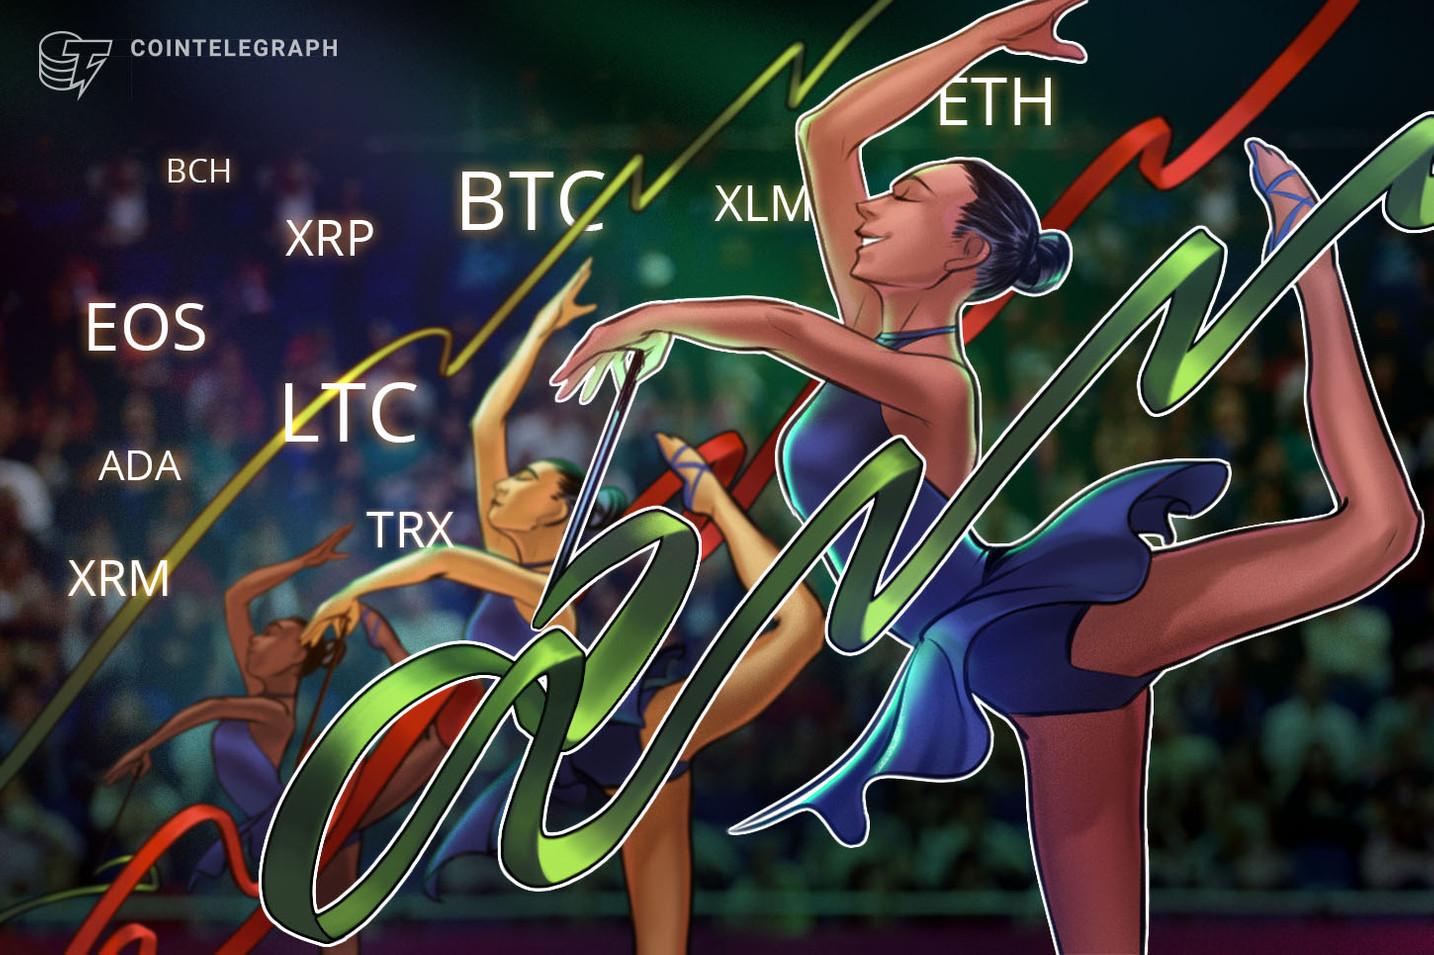 Kursanalyse, 3. Dezember: Bitcoin, Ripple, Ethereum, Bitcoin Cash, Stellar, EOS, Litecoin, Cardano, Monero, TRON